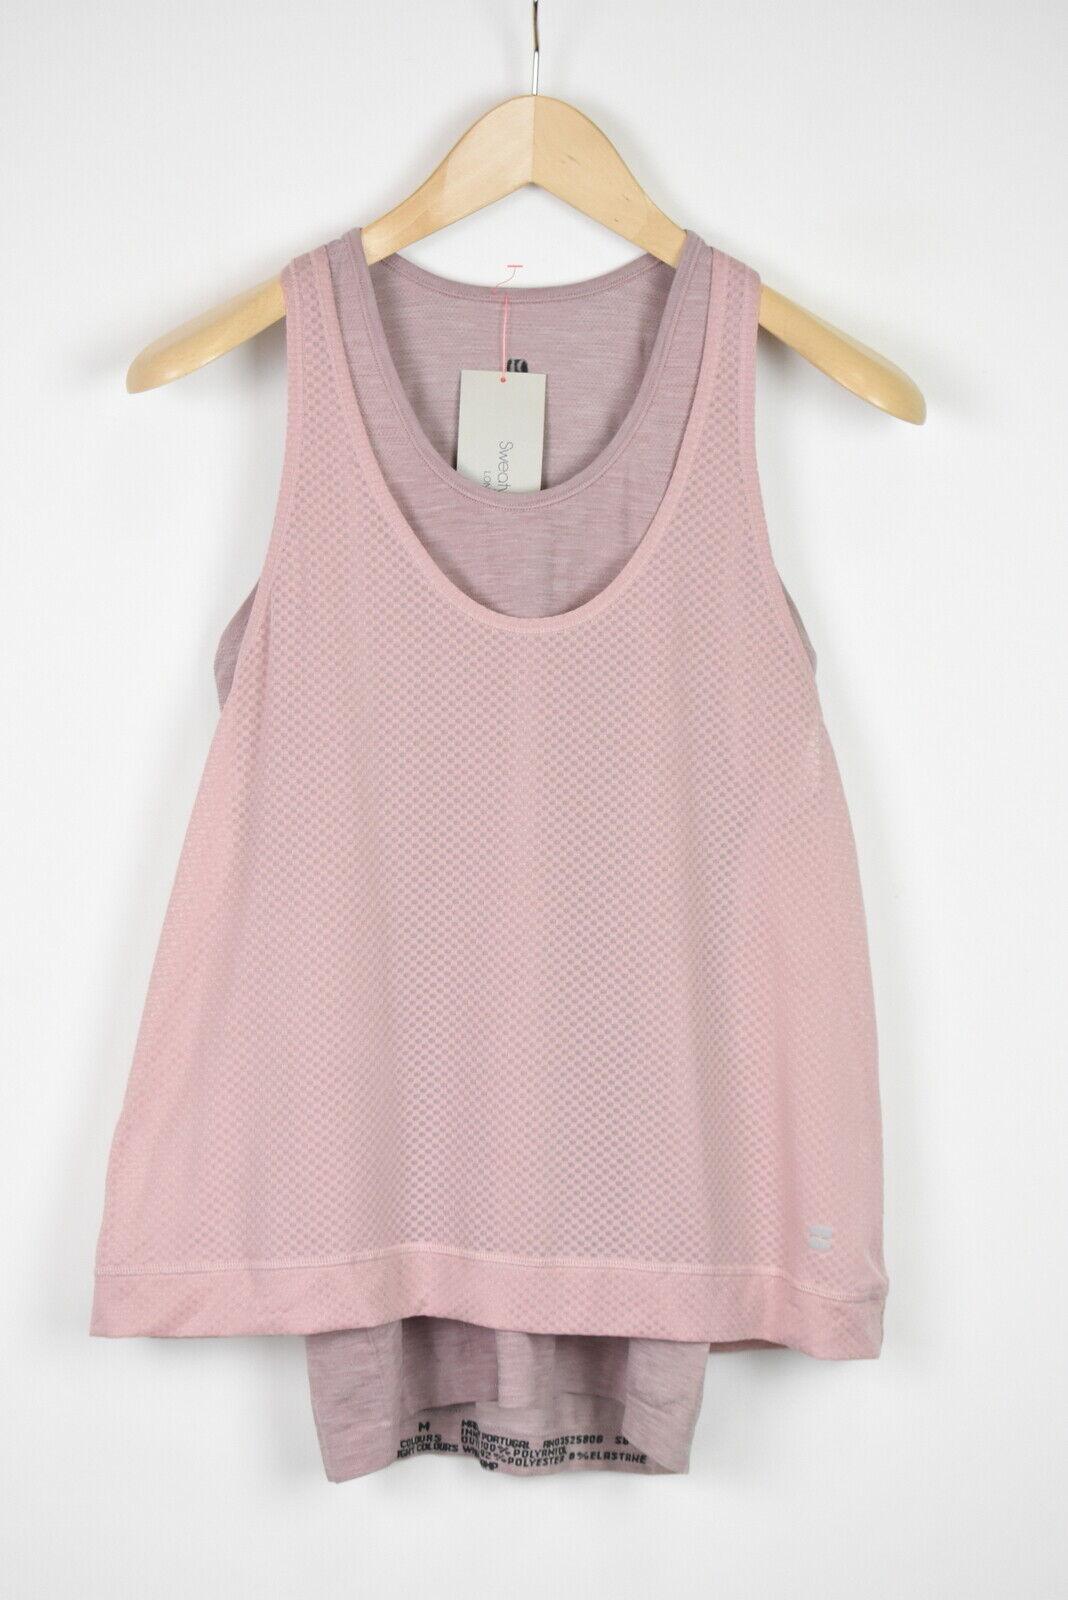 RRP SWEATY BETTY DOUBLE TIME 2 IN 1 Women MEDIUM Workout Vest Top 18512*